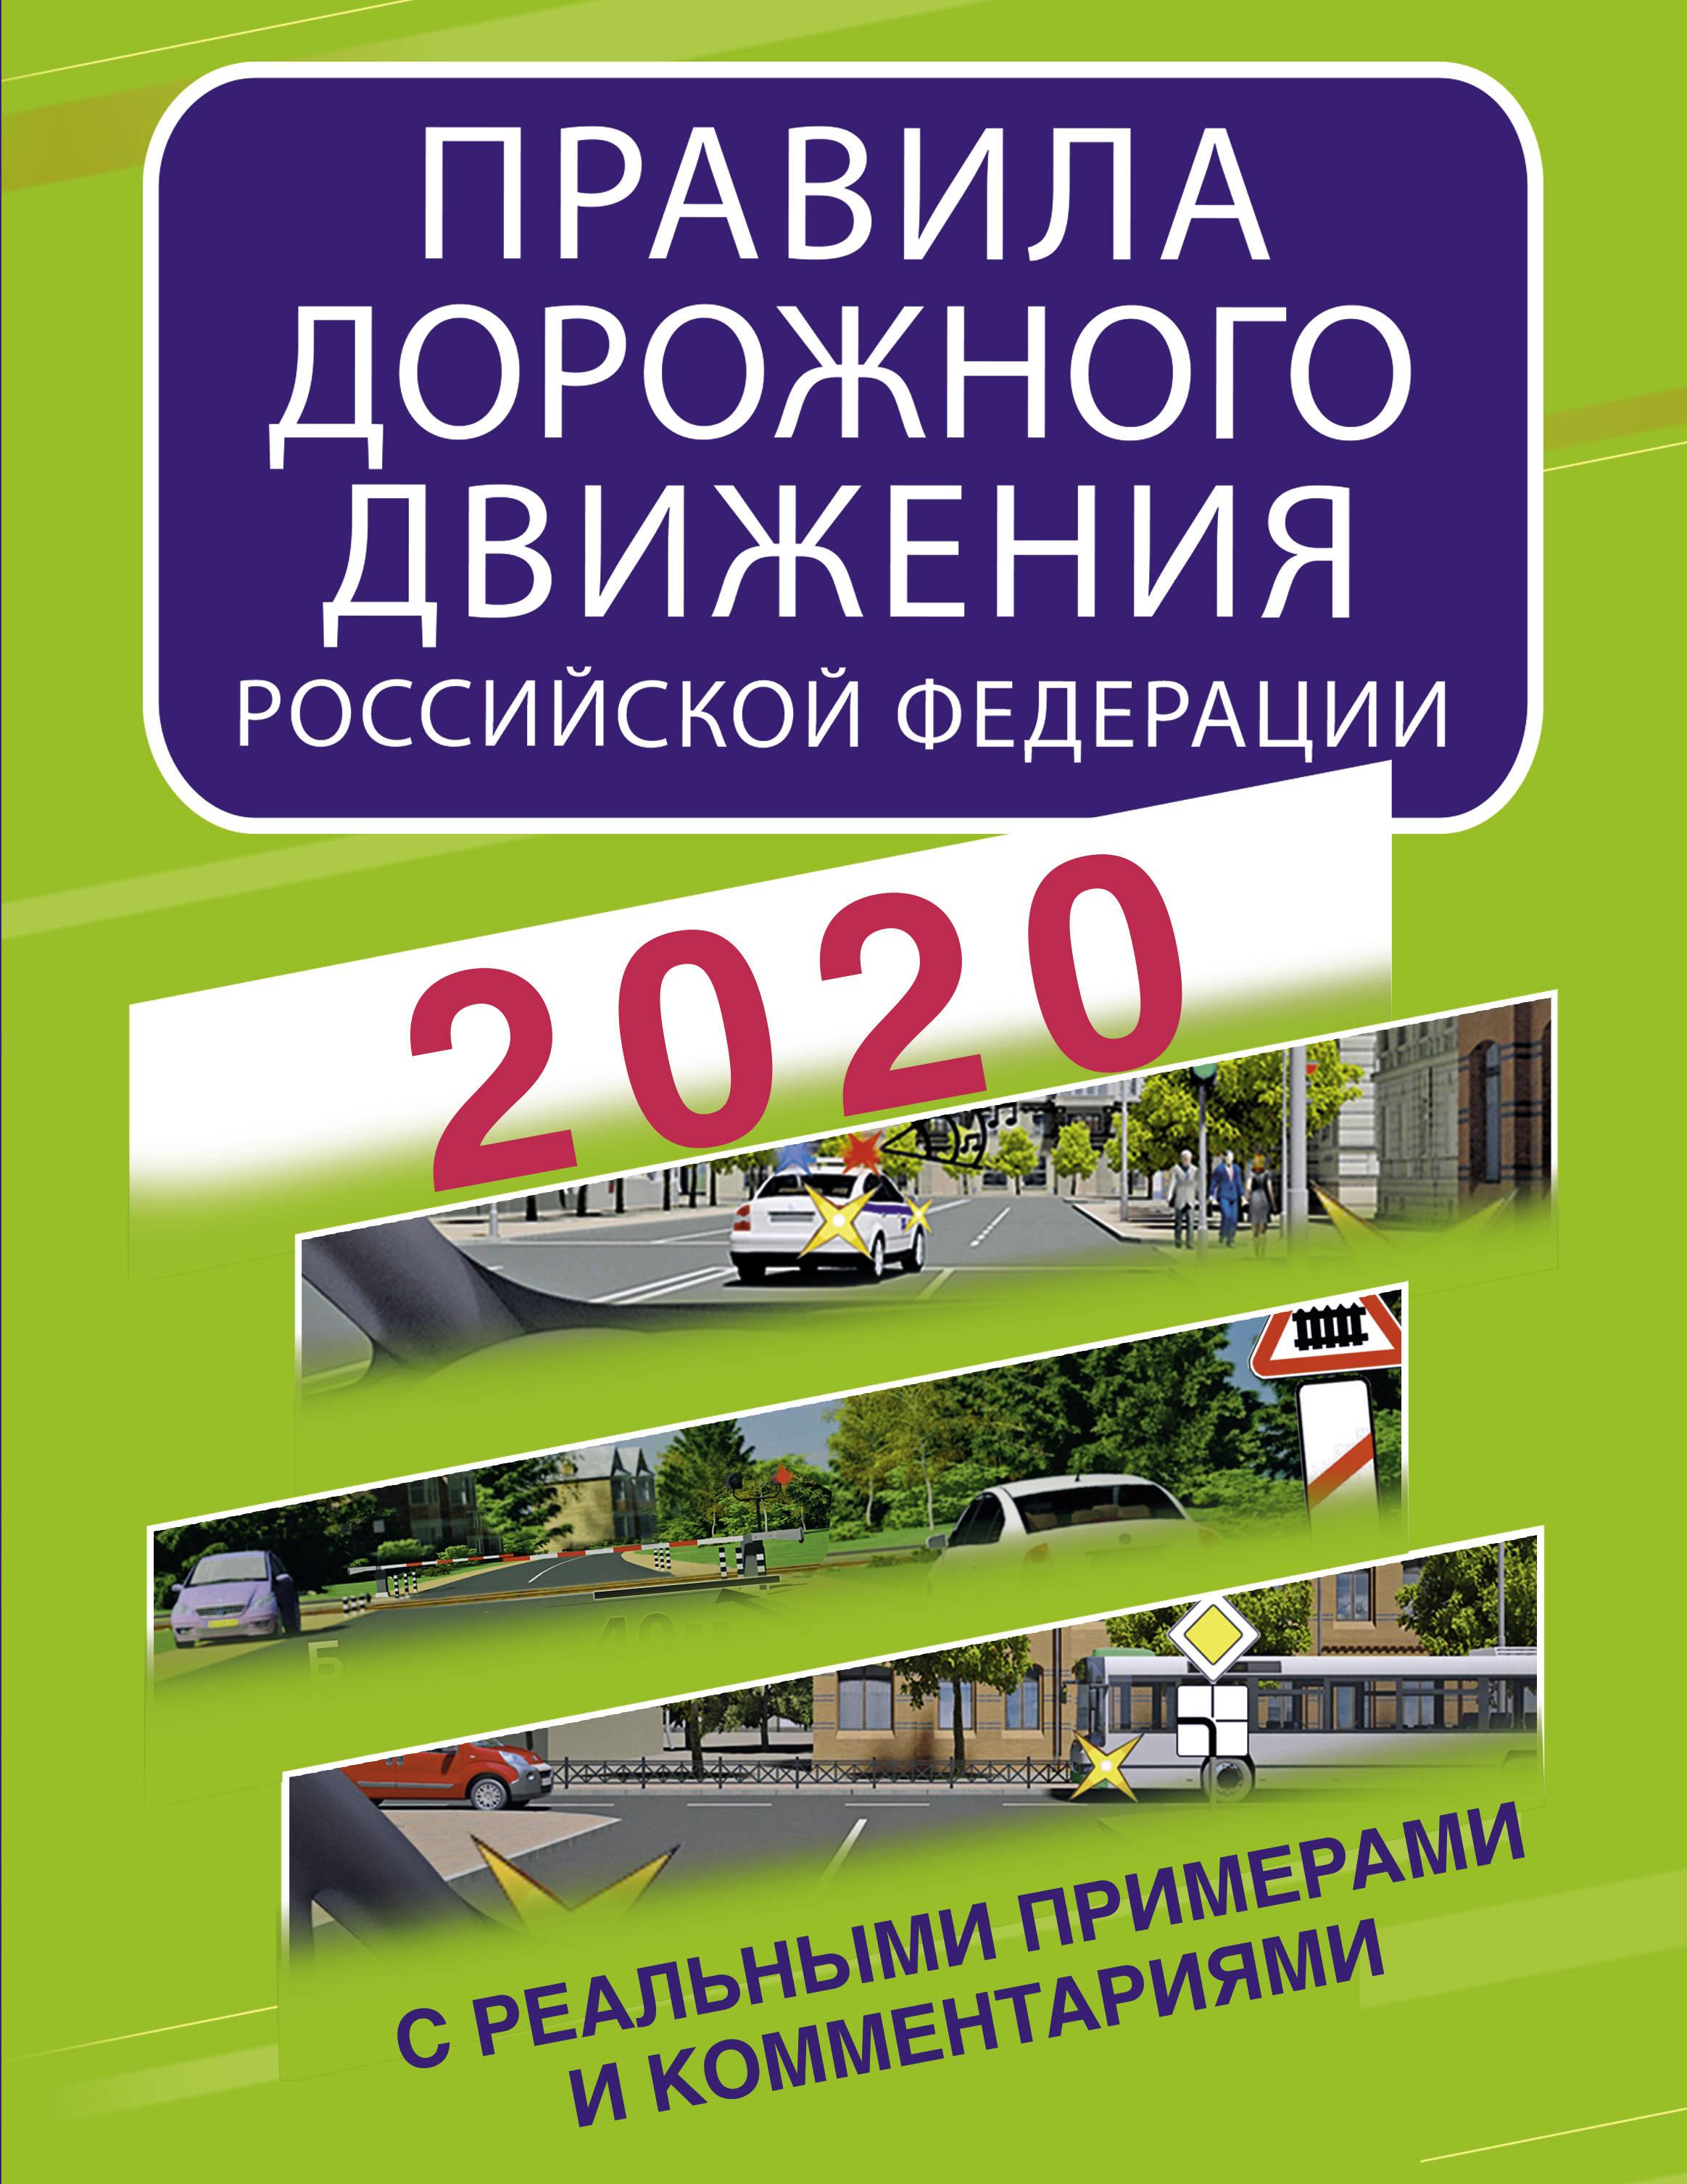 Pravila dorozhnogo dvizhenija Rossijskoj Federatsii s realnymi primerami i kommentarijami na 2020 god